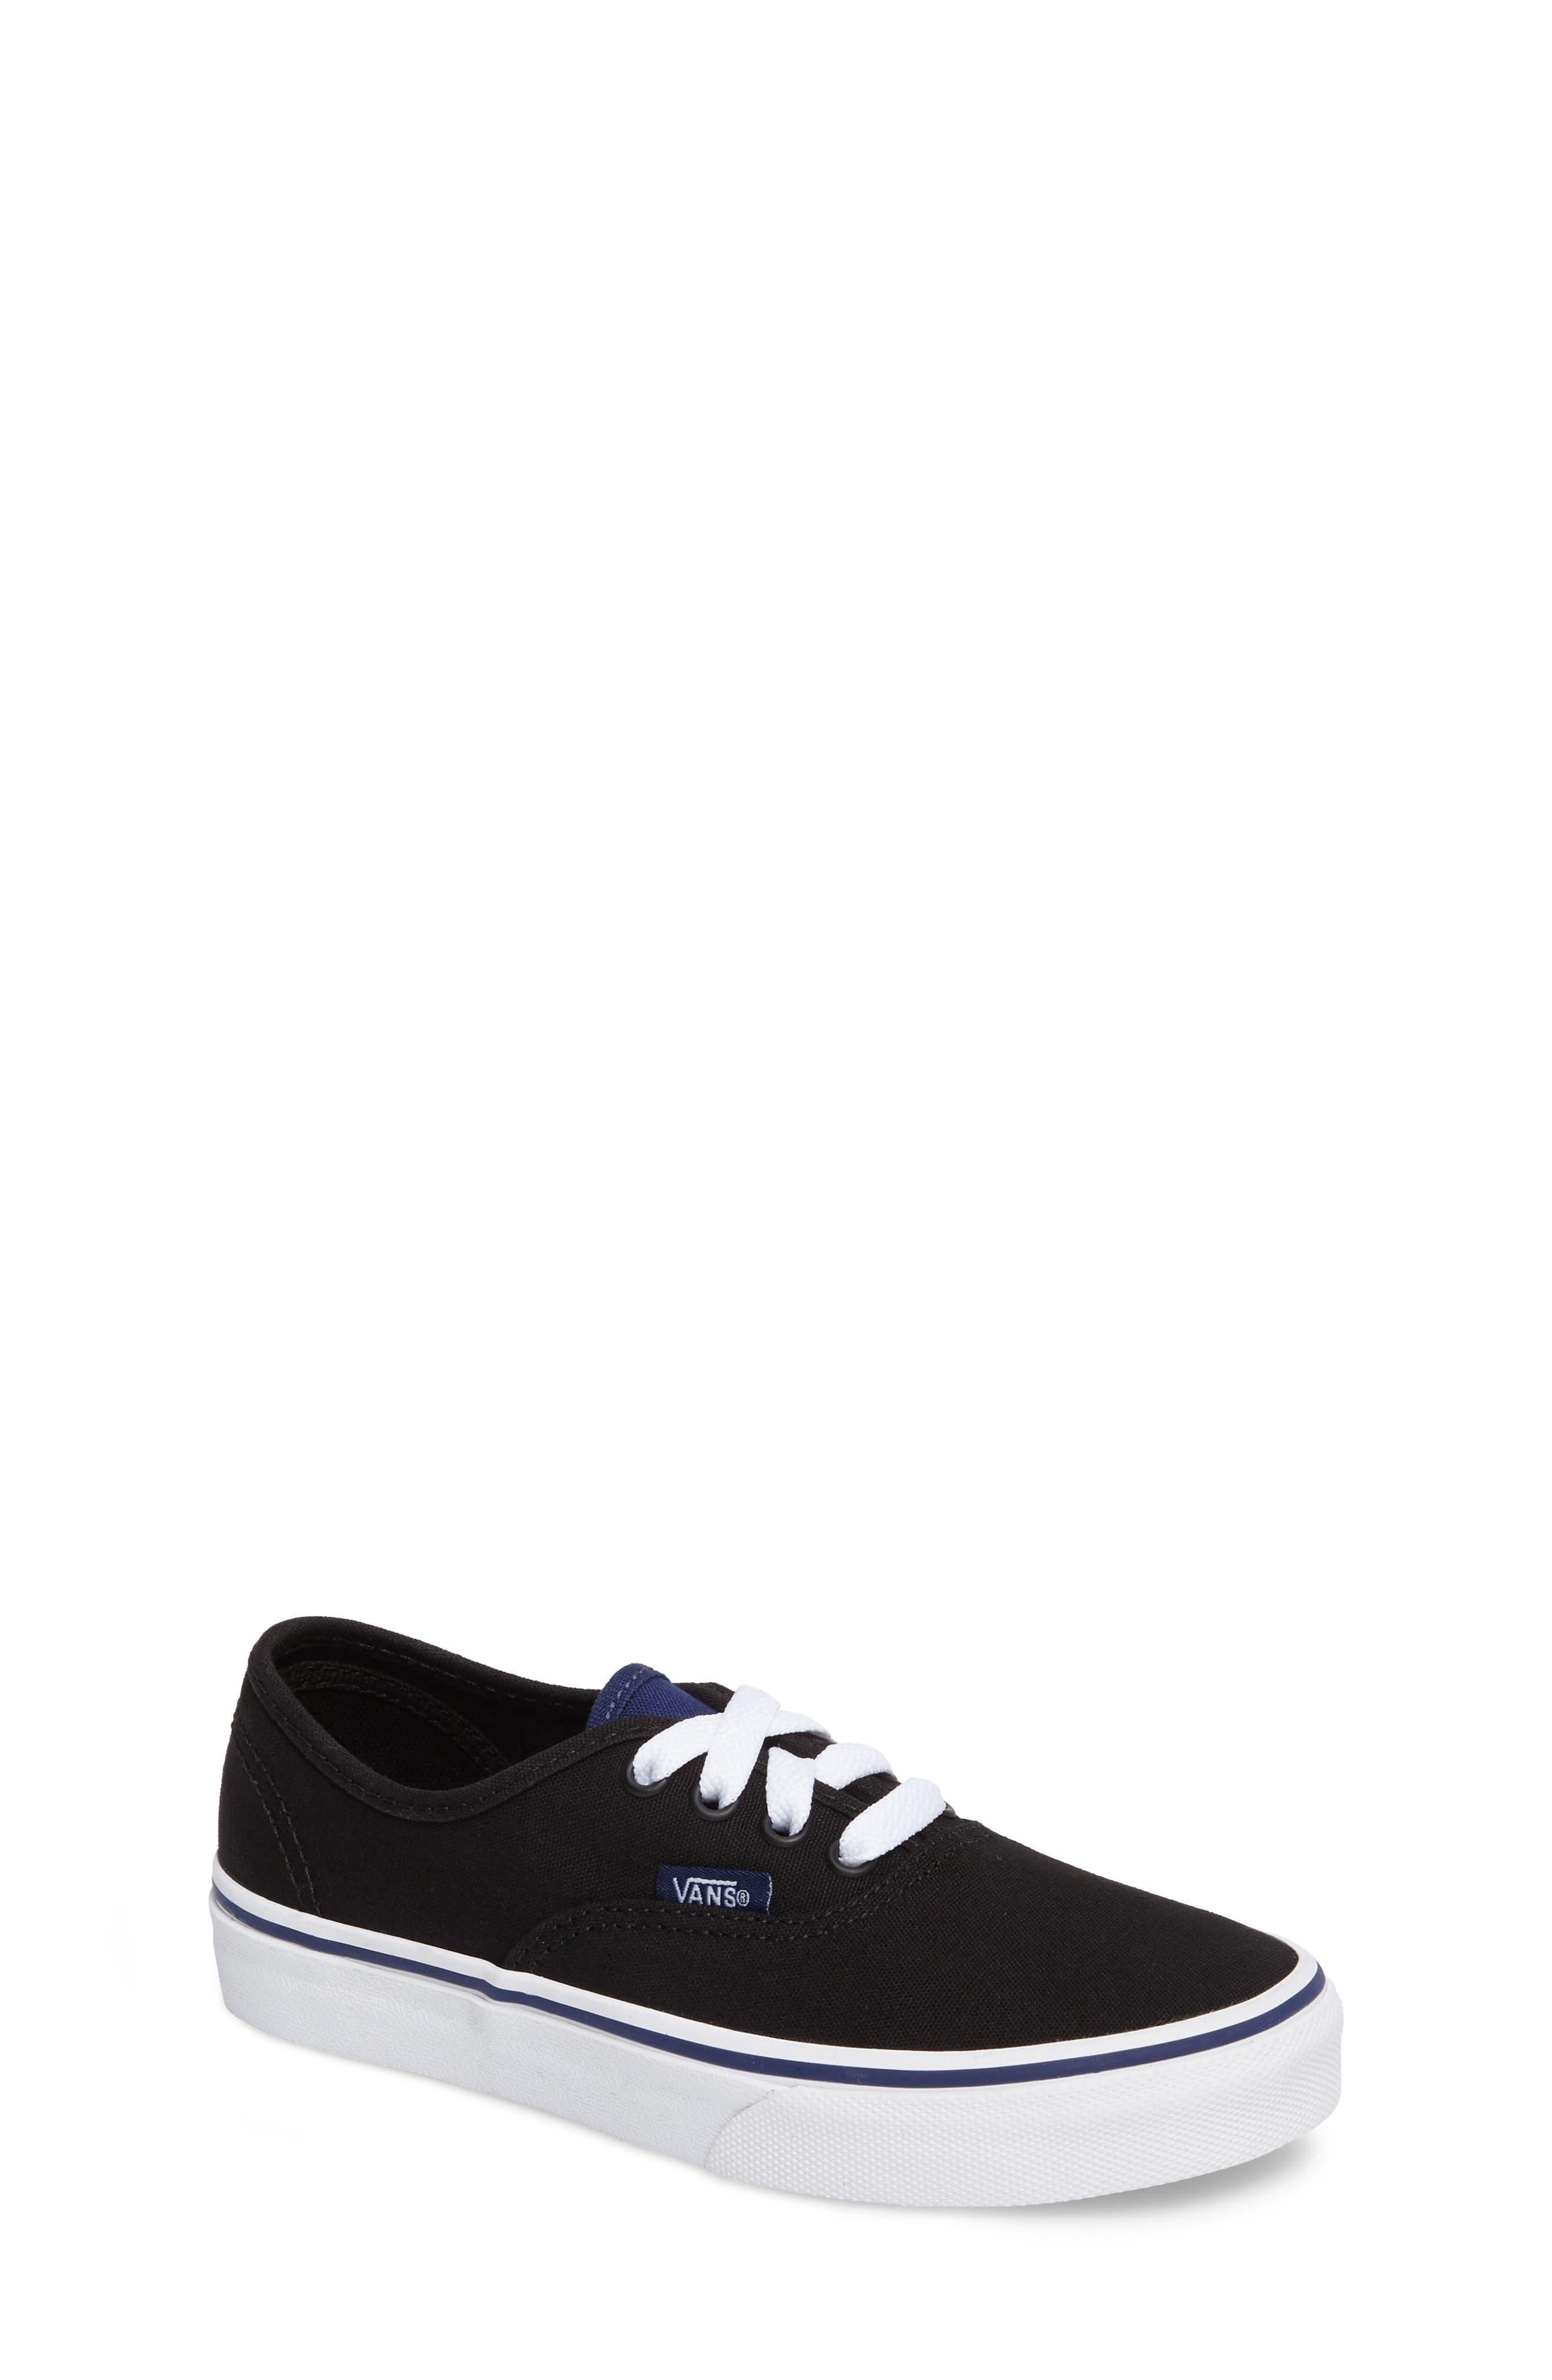 Main Image - Vans 'Authentic' Sneaker (Little Kid & Big Kid)